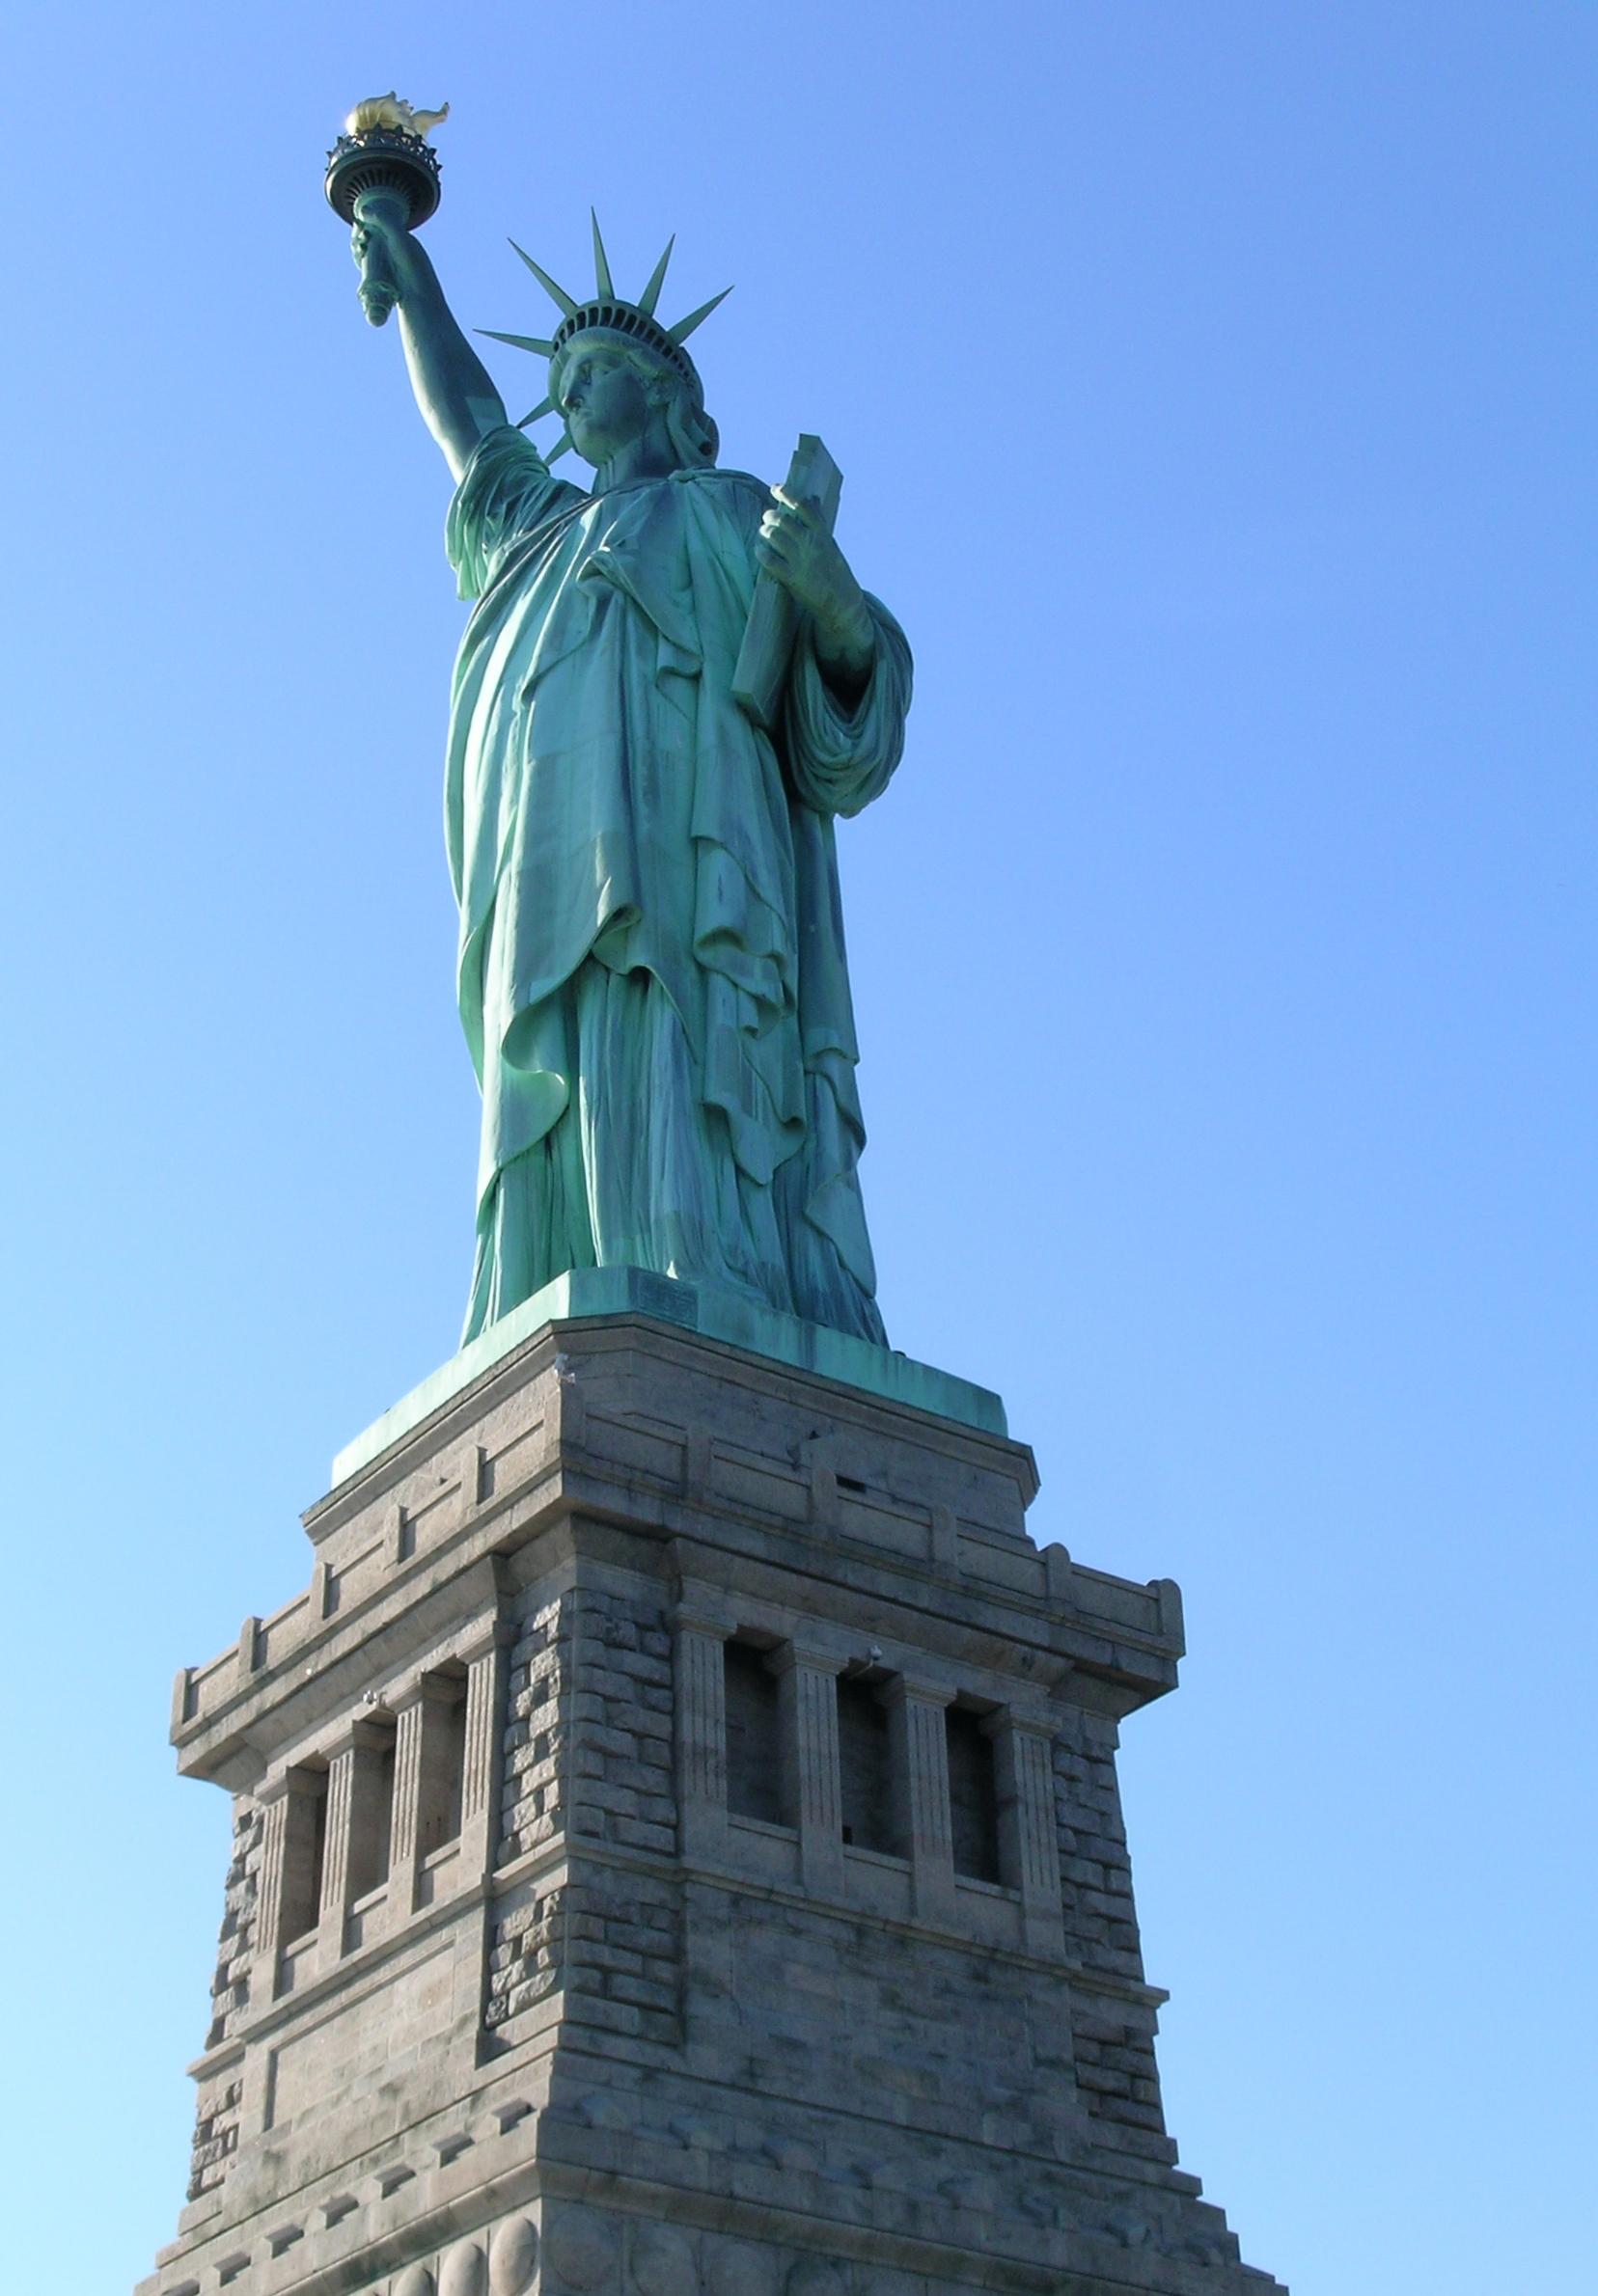 external image Statue-of-Liberty-statue-of-liberty-32363539-1656-2380.jpg